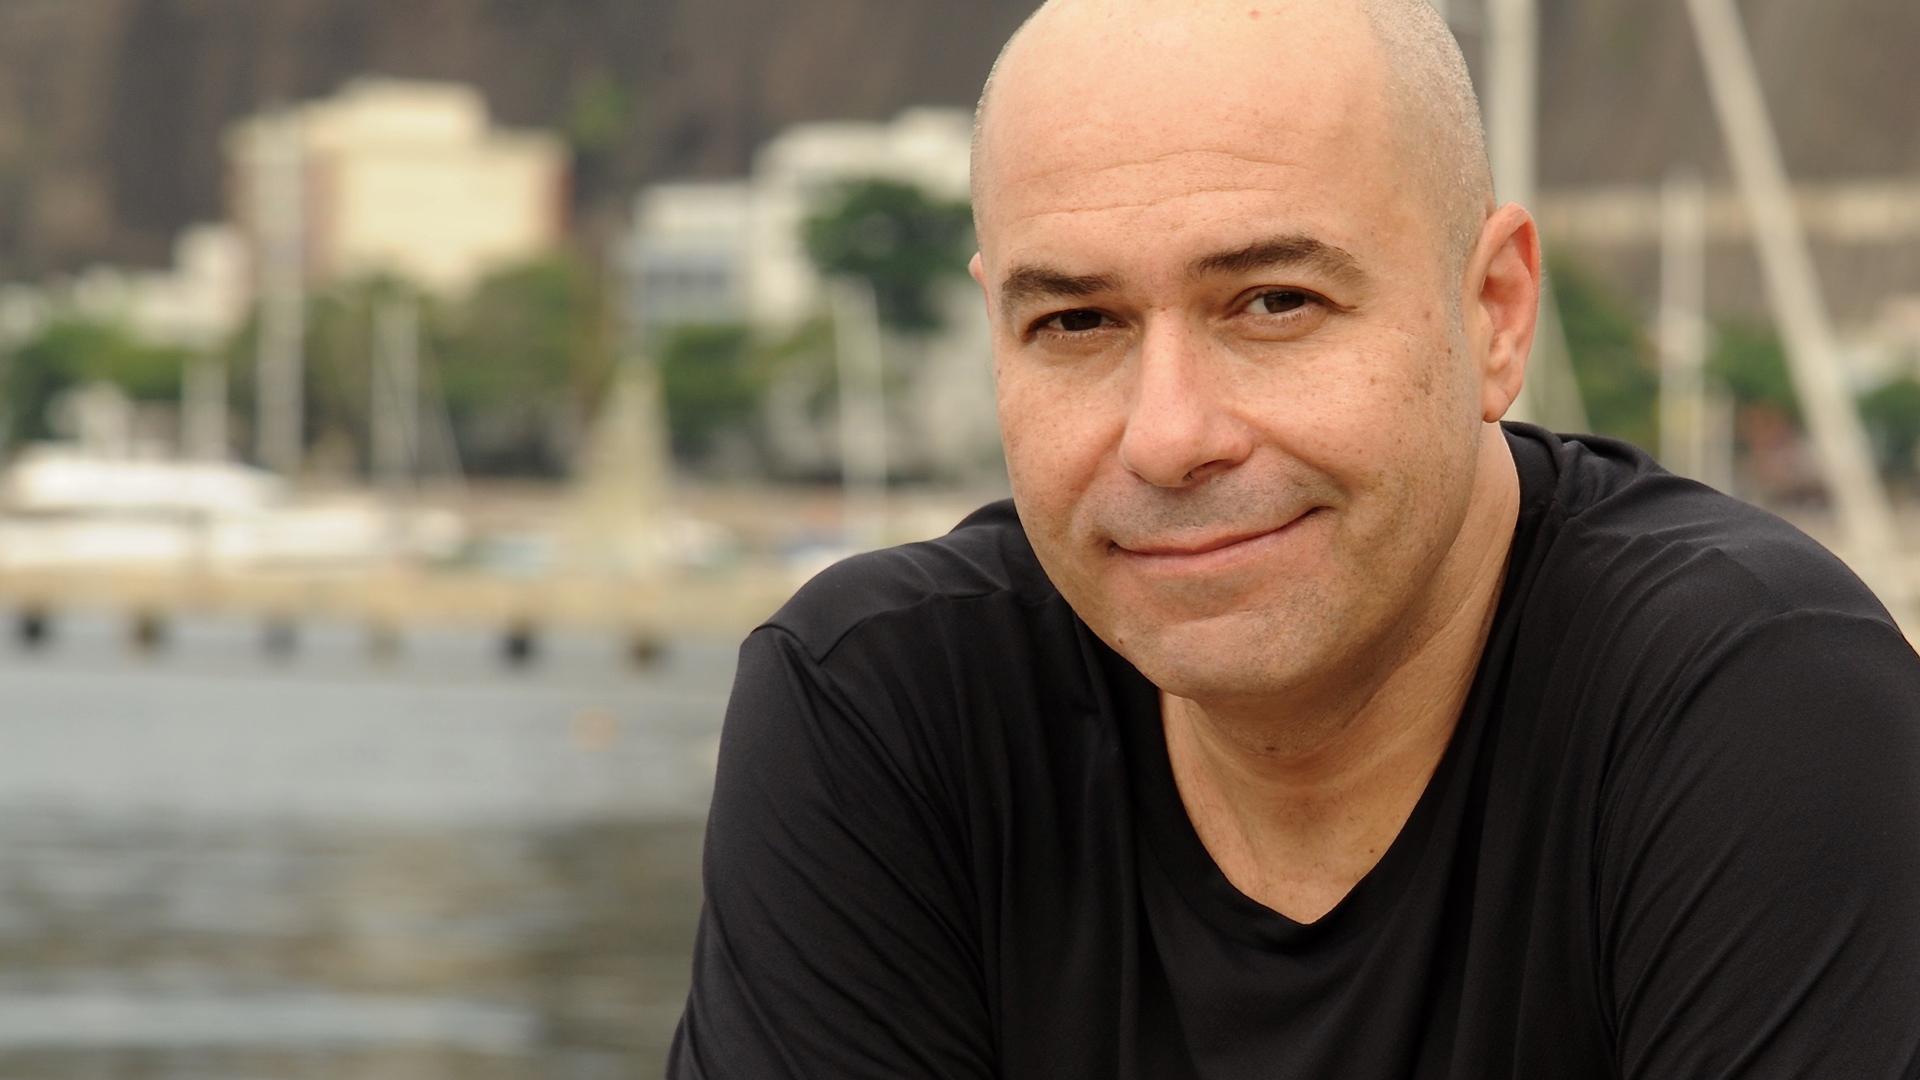 Hamleto Stamato Trio lançando: Ponte Aérea com Erivelton Silva e Augusto Mattoso